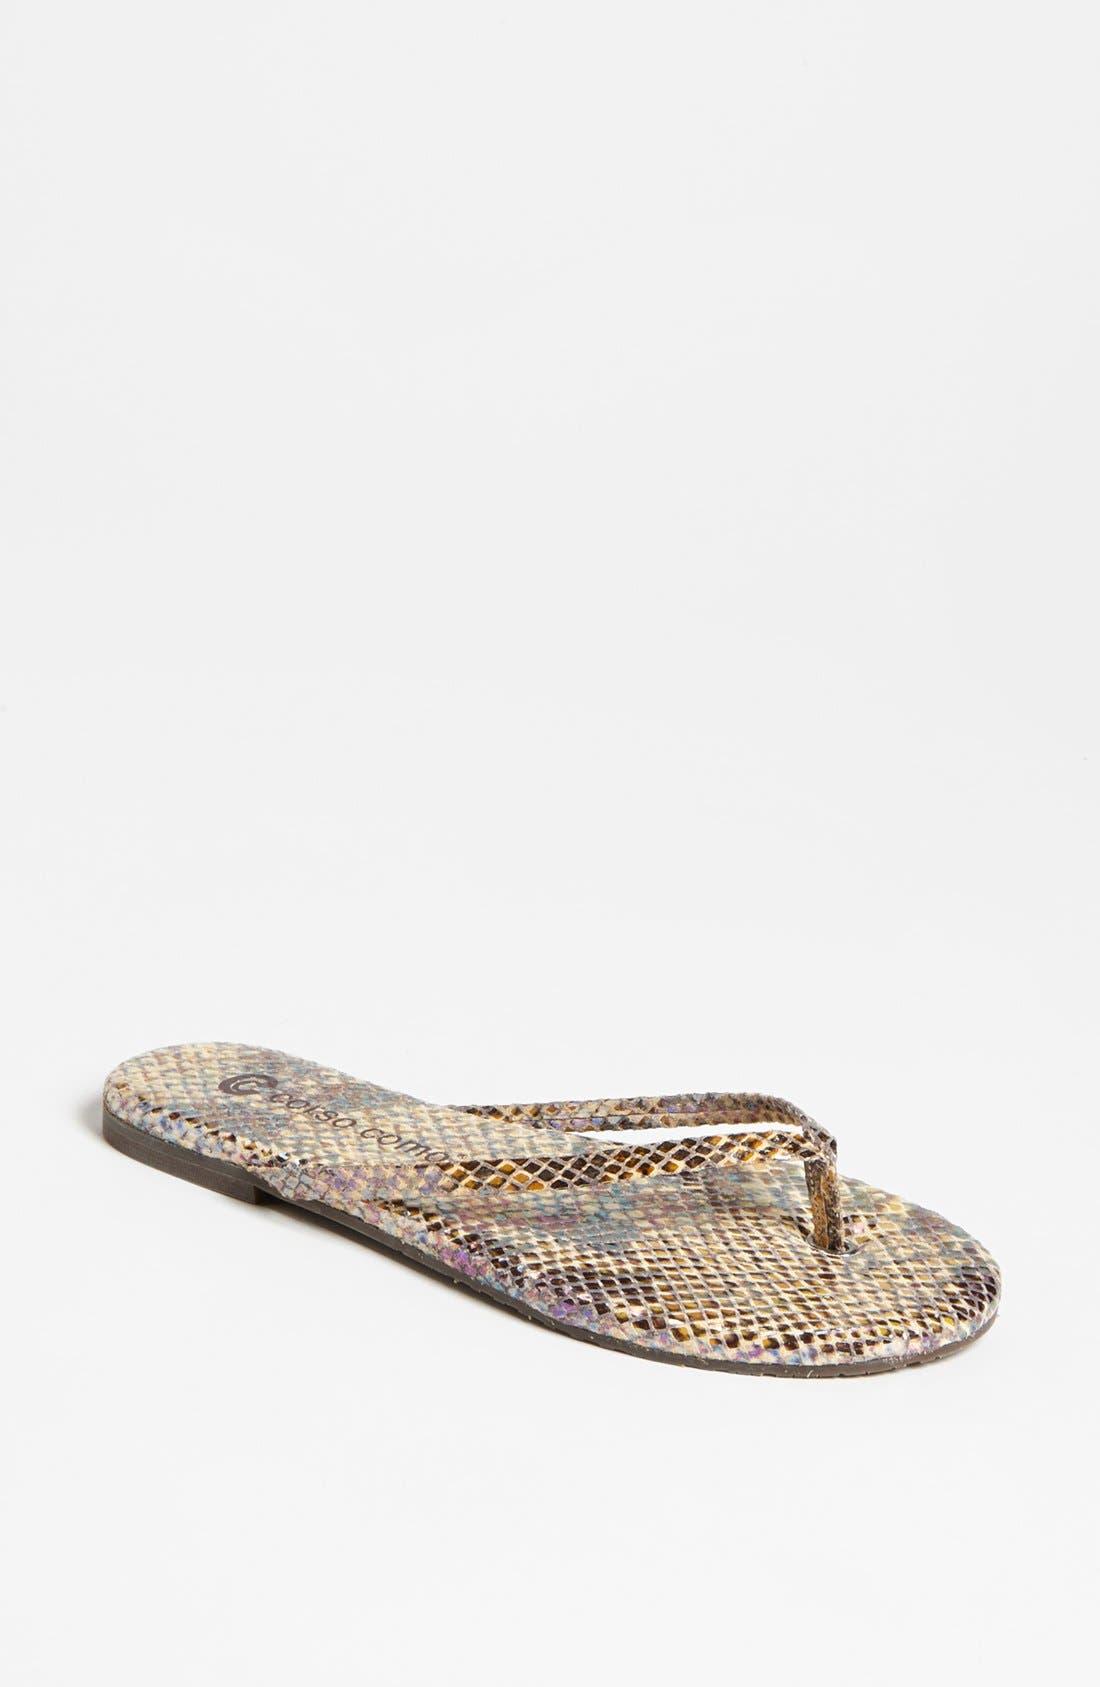 Alternate Image 1 Selected - Corso Como 'Beachball' Sandal